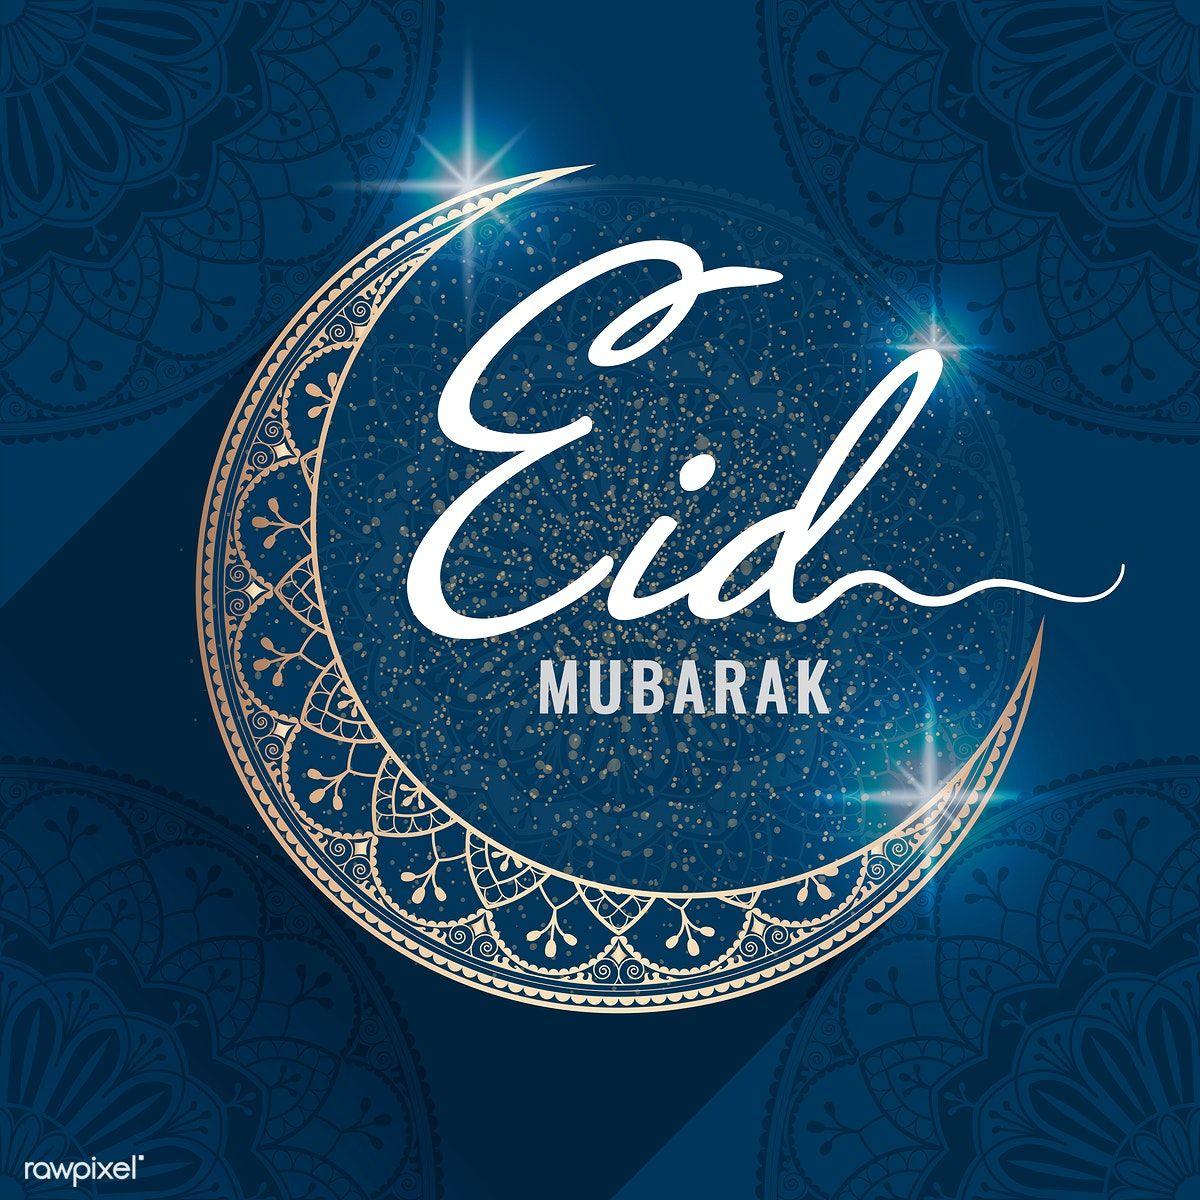 Download premium vector of Eid Mubarak card with a crescent moon